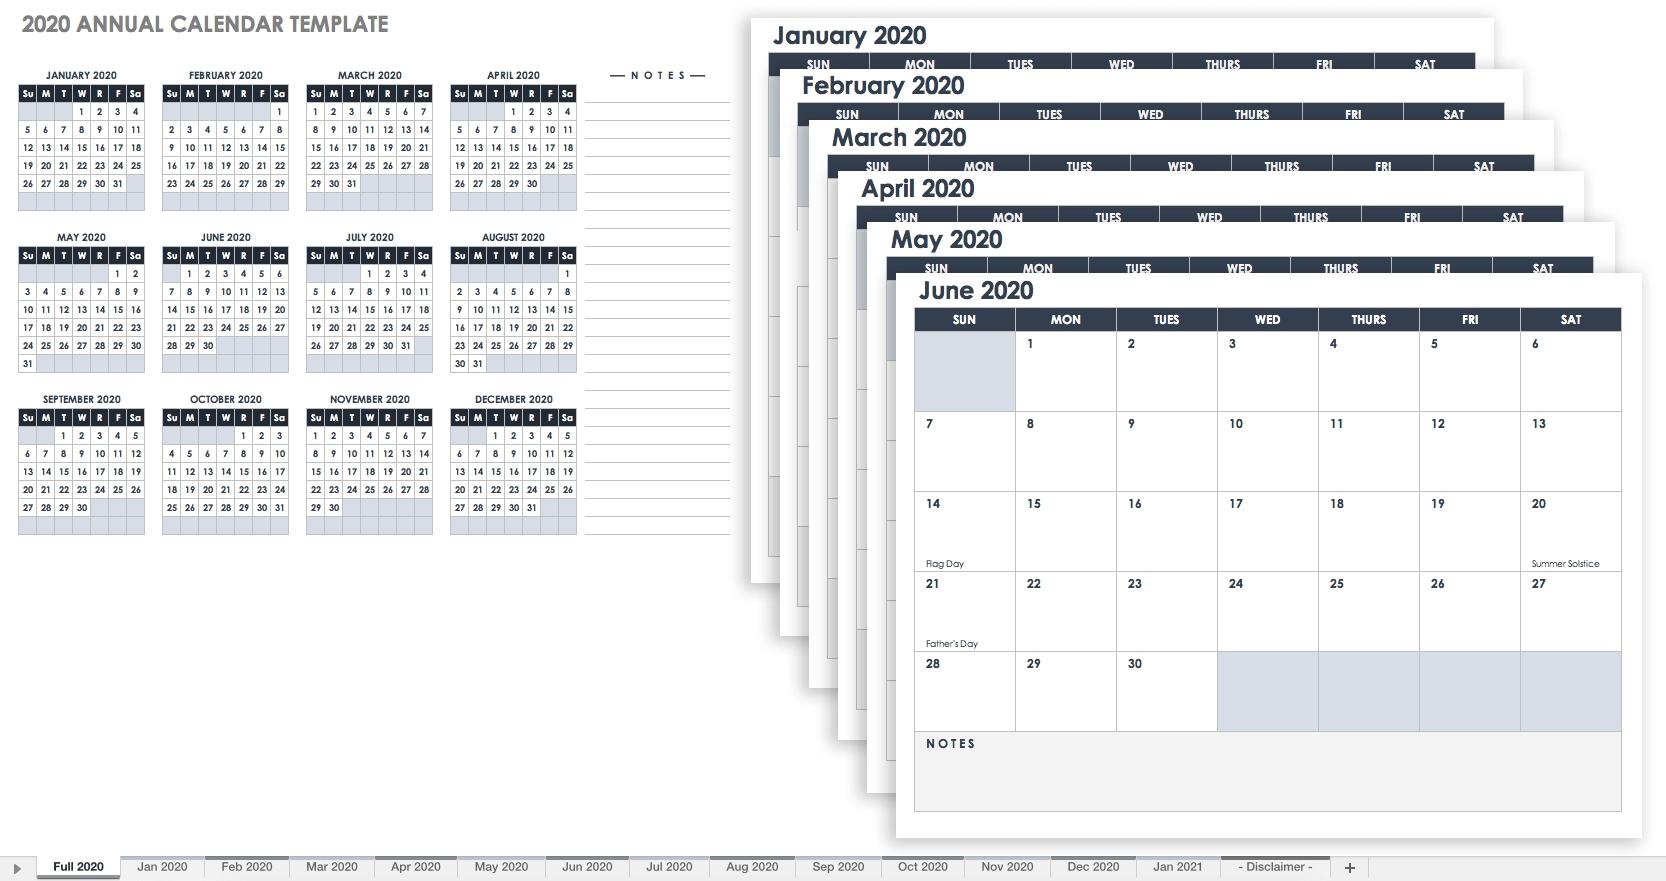 Free Blank Calendar Templates - Smartsheet inside Free Printable Monthly Calendar With Lines